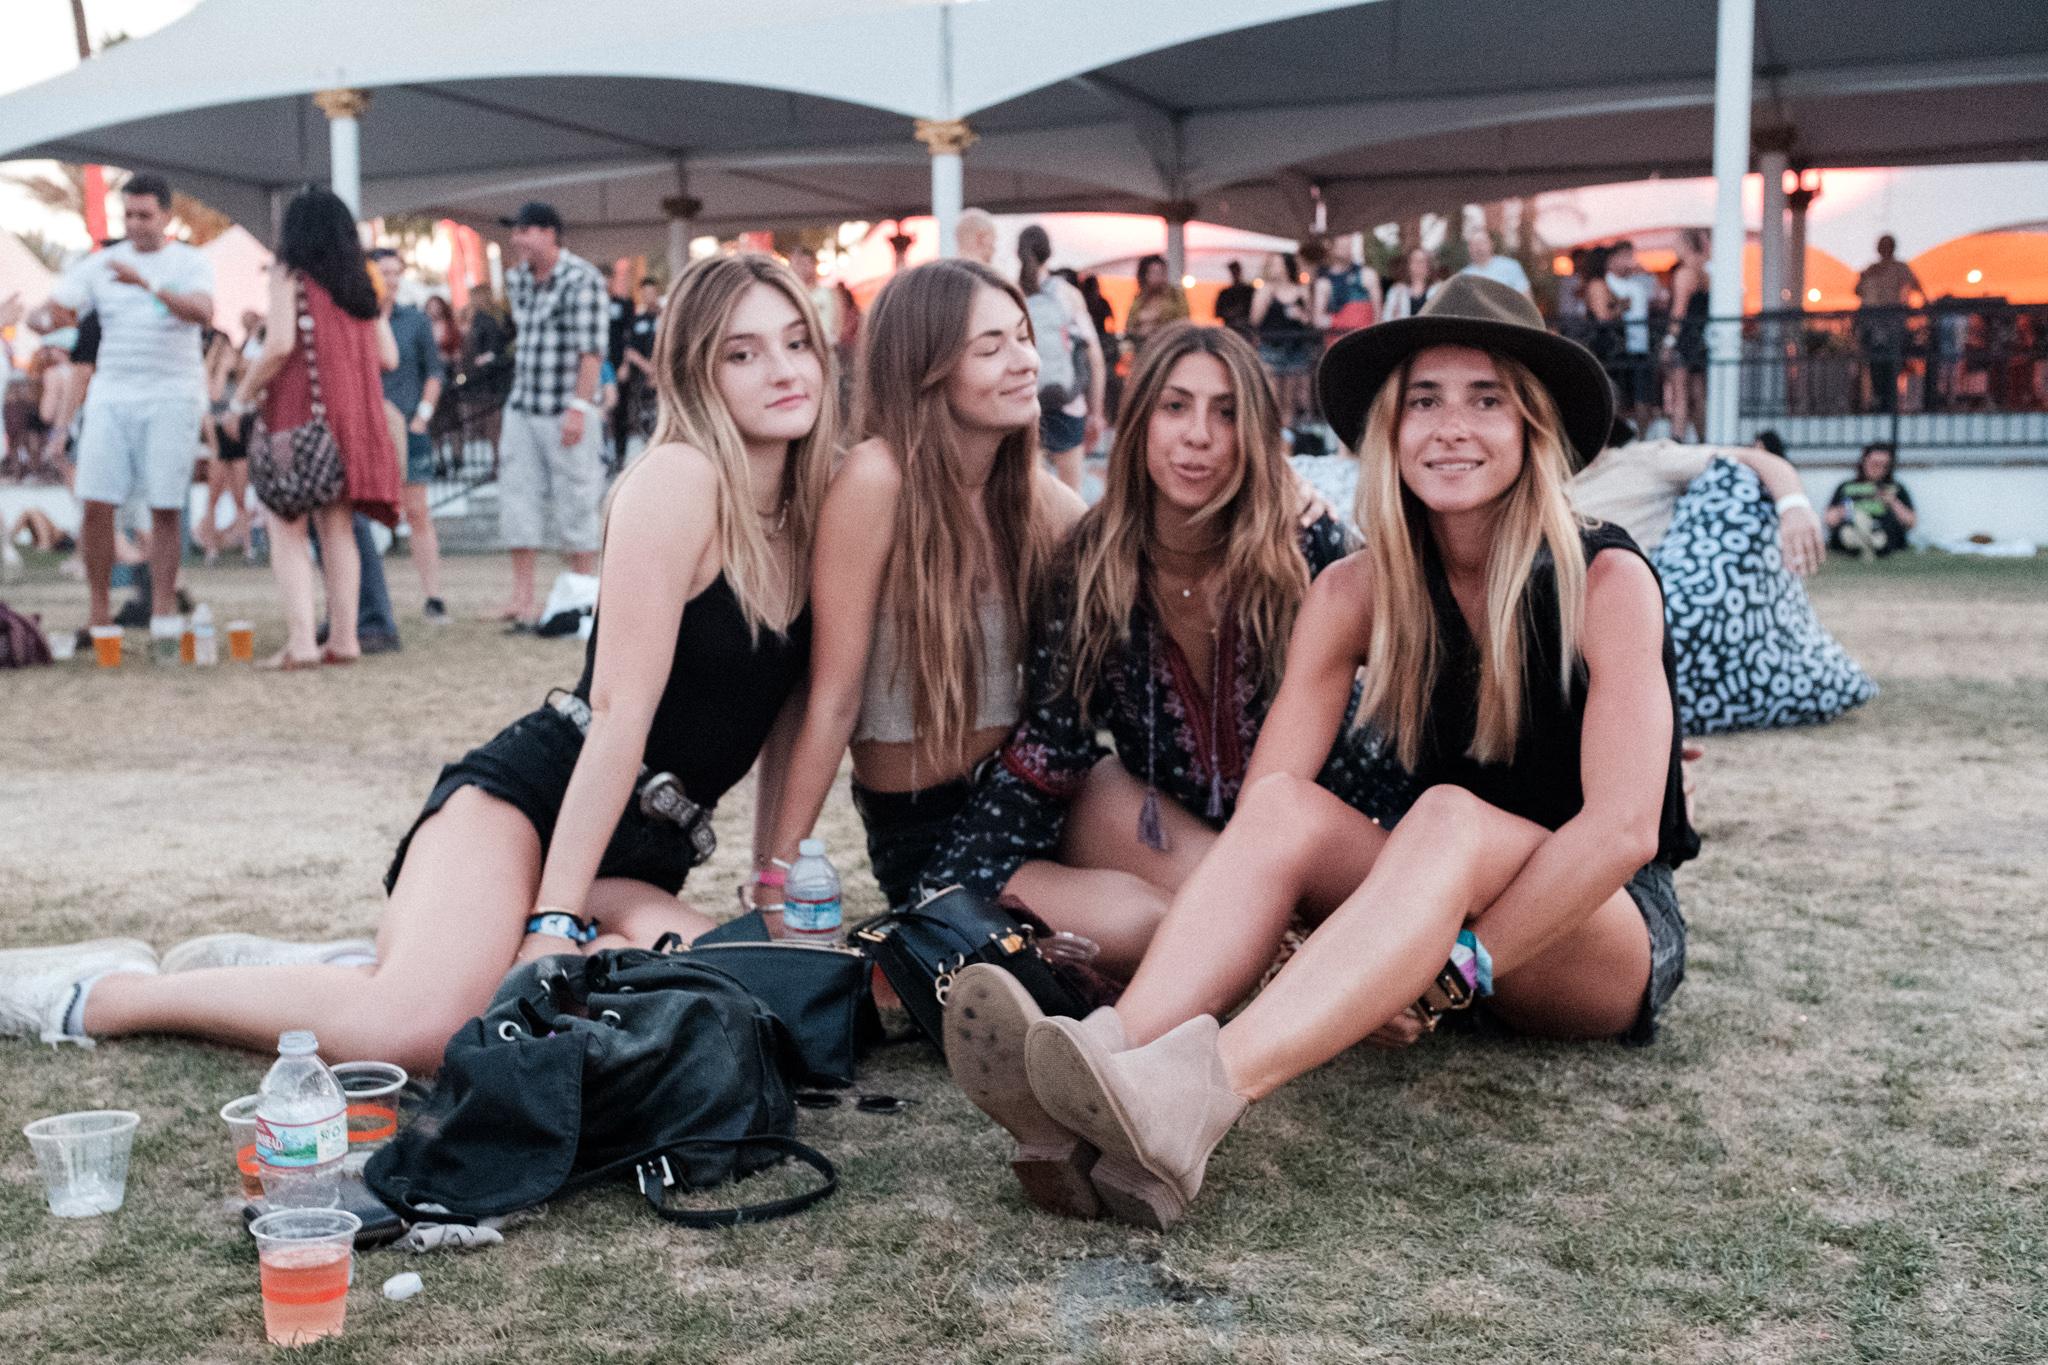 170423 Coachella 17 w2 2101.jpg